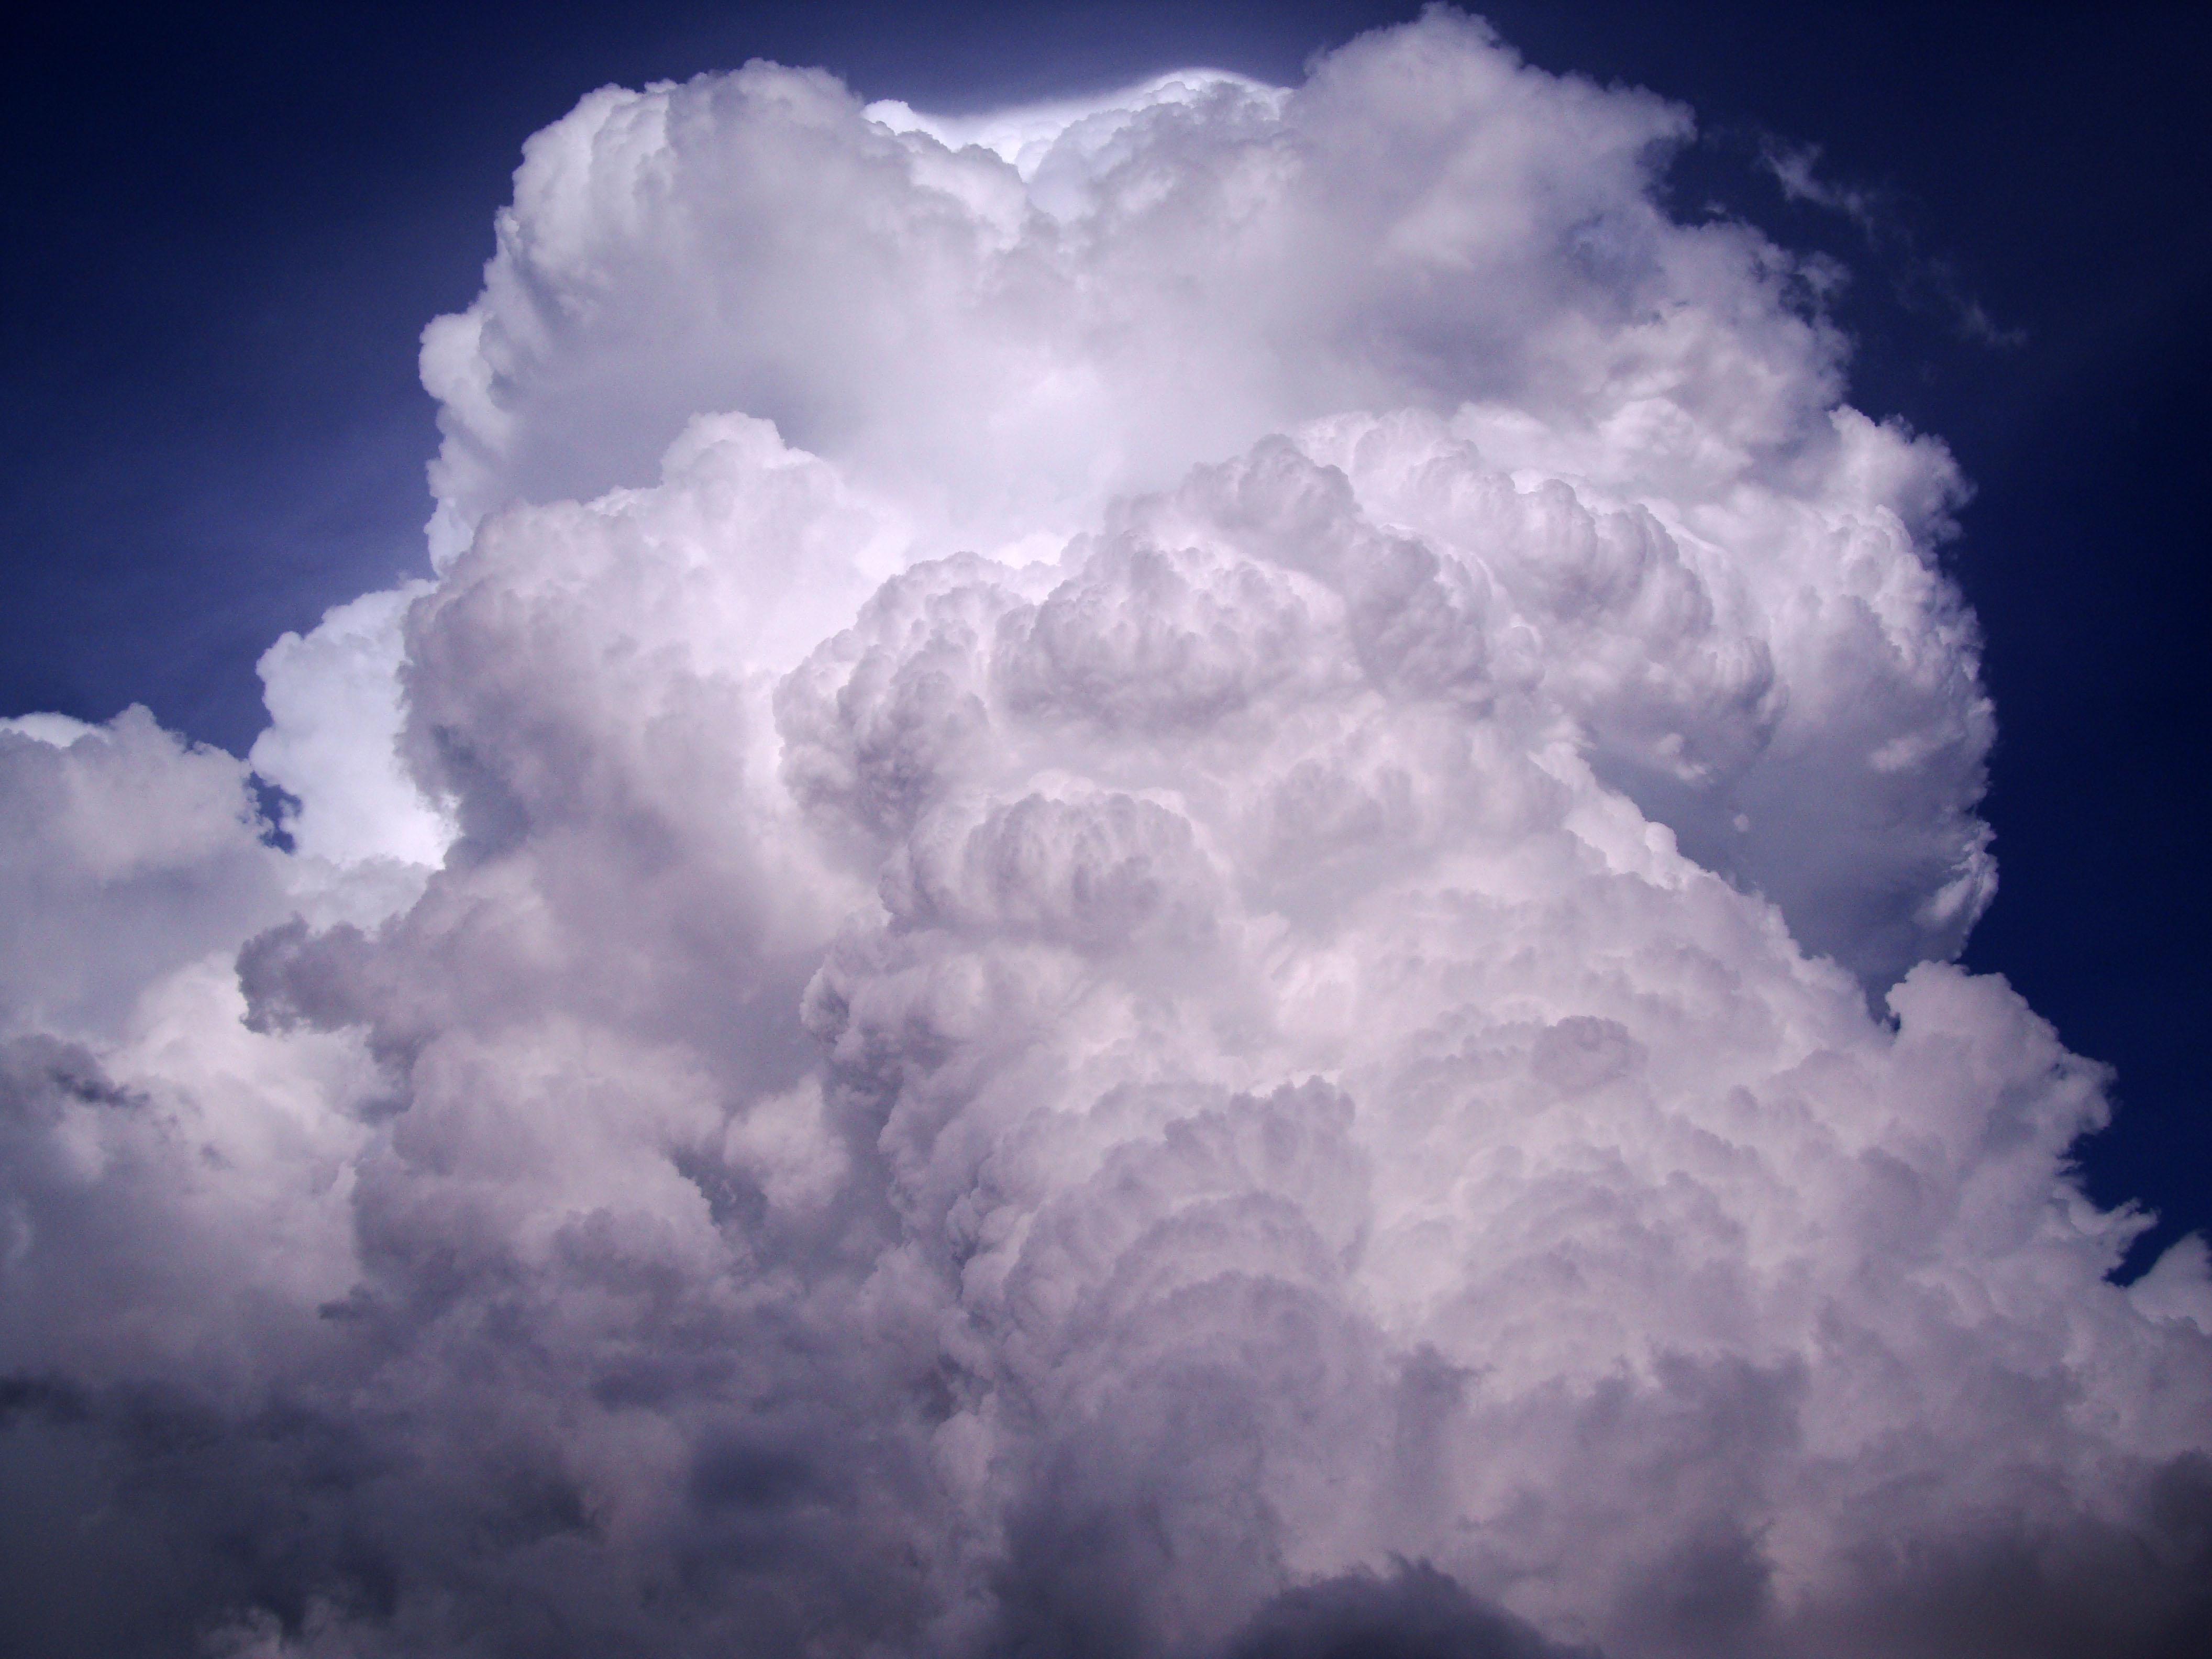 Cumulonimbus Clouds Formations Sky Storms Weather Phenomena 18